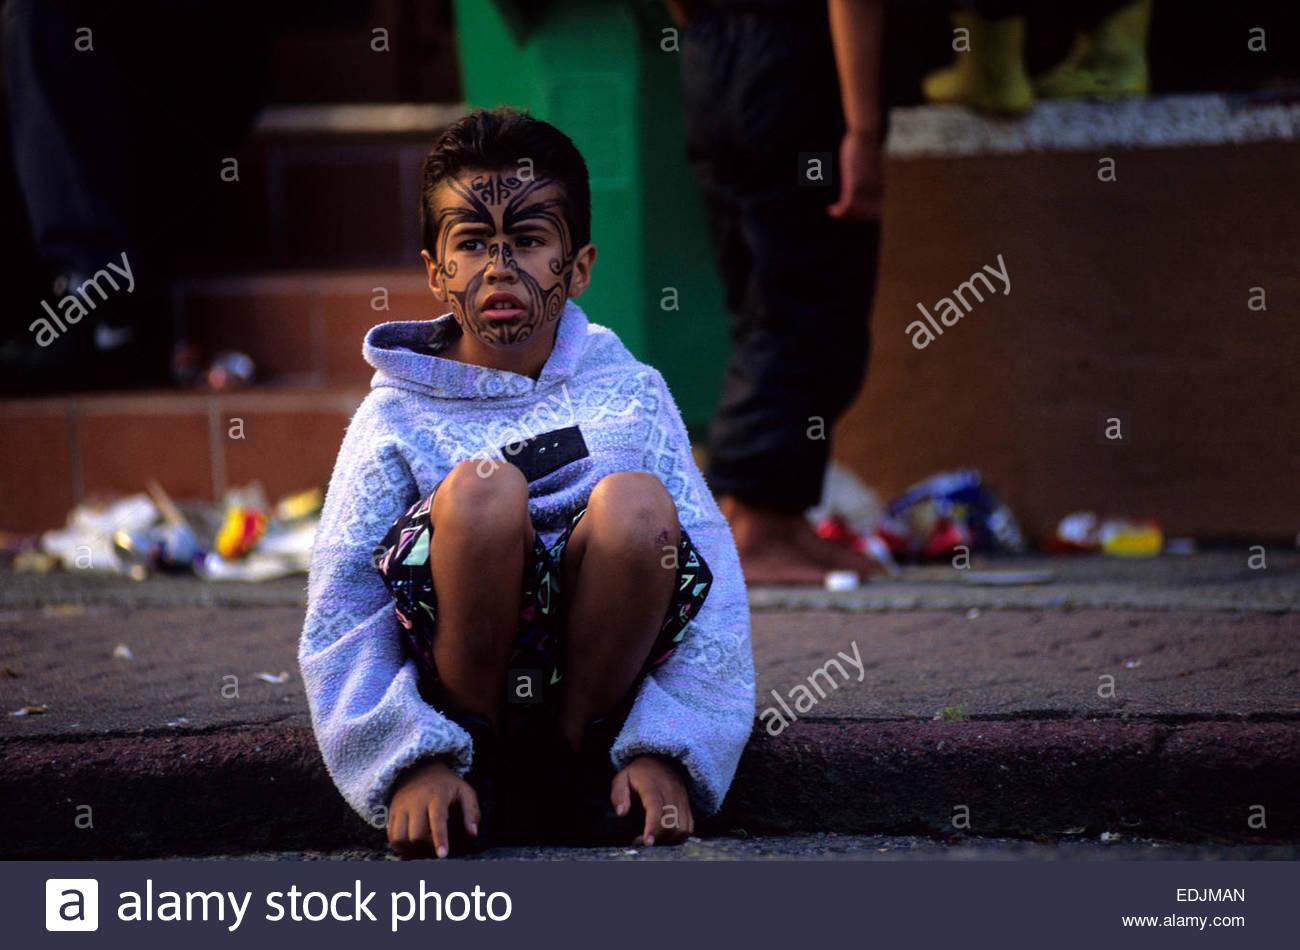 Young Maori boy, Rotorua, North Island, New Zealand. - Stock Image